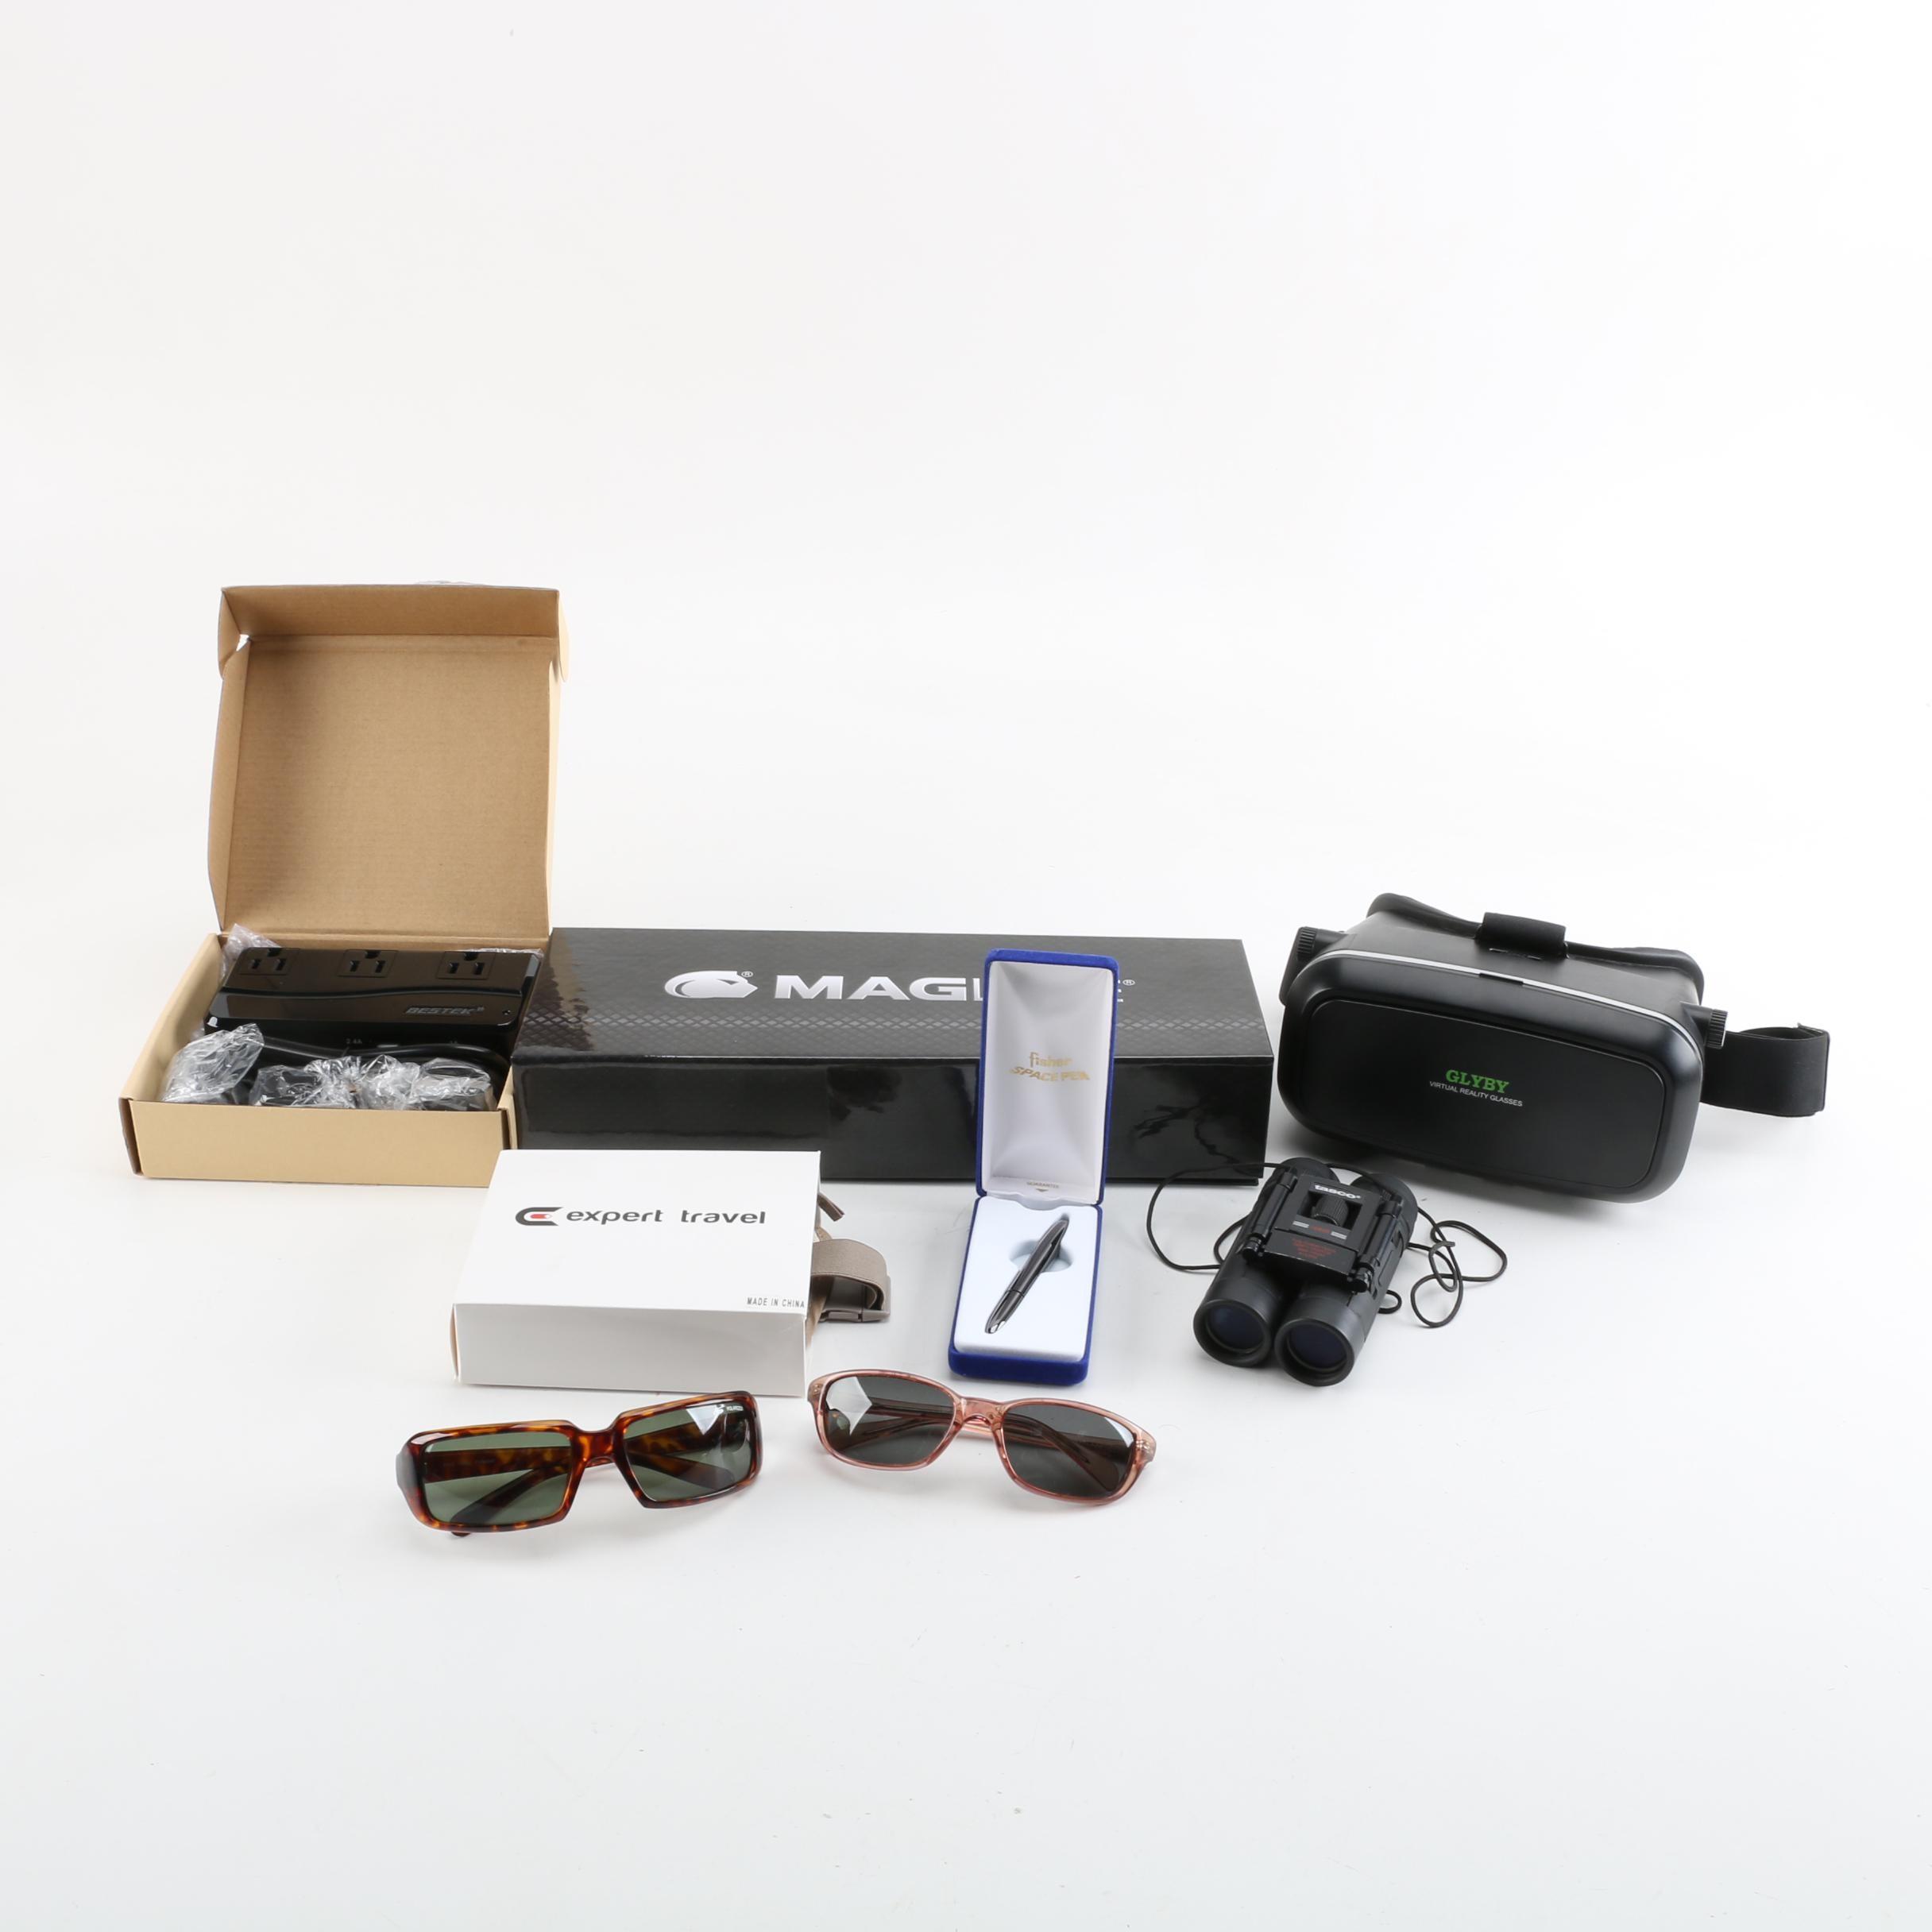 Fischer Space Pen, Tasco Binoculars, Maglite, Bestek Power Inverter and More